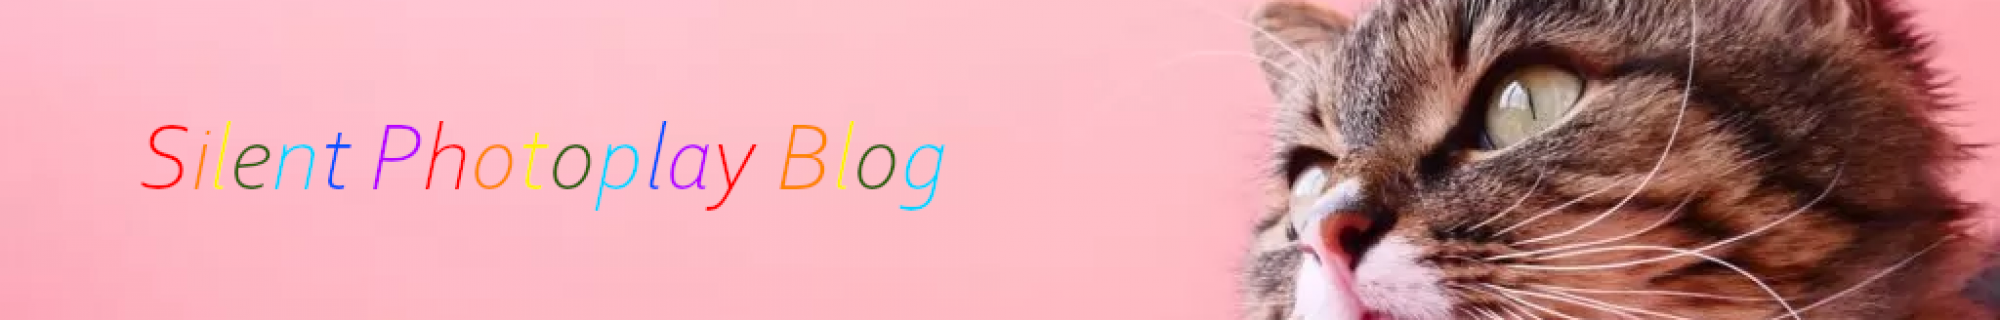 SilentPhotoplay Blog